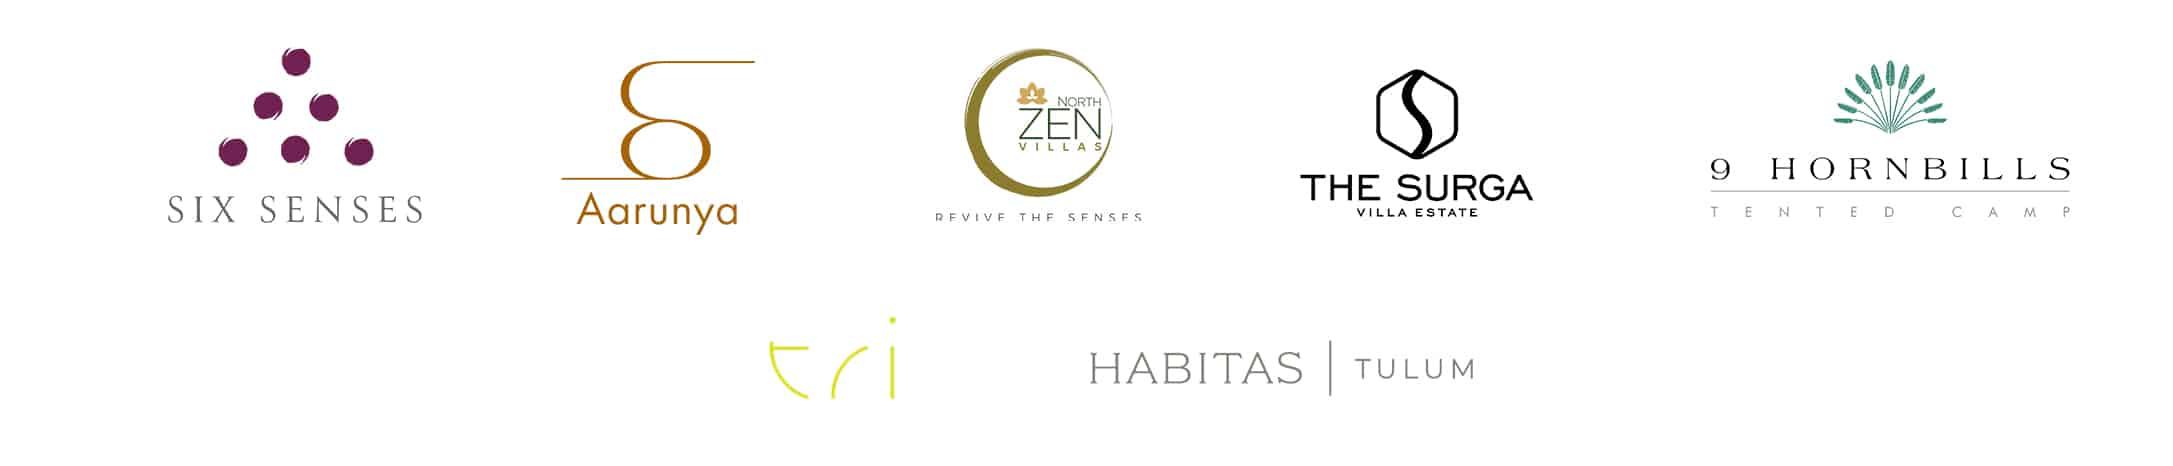 clients-luxury-resort-video